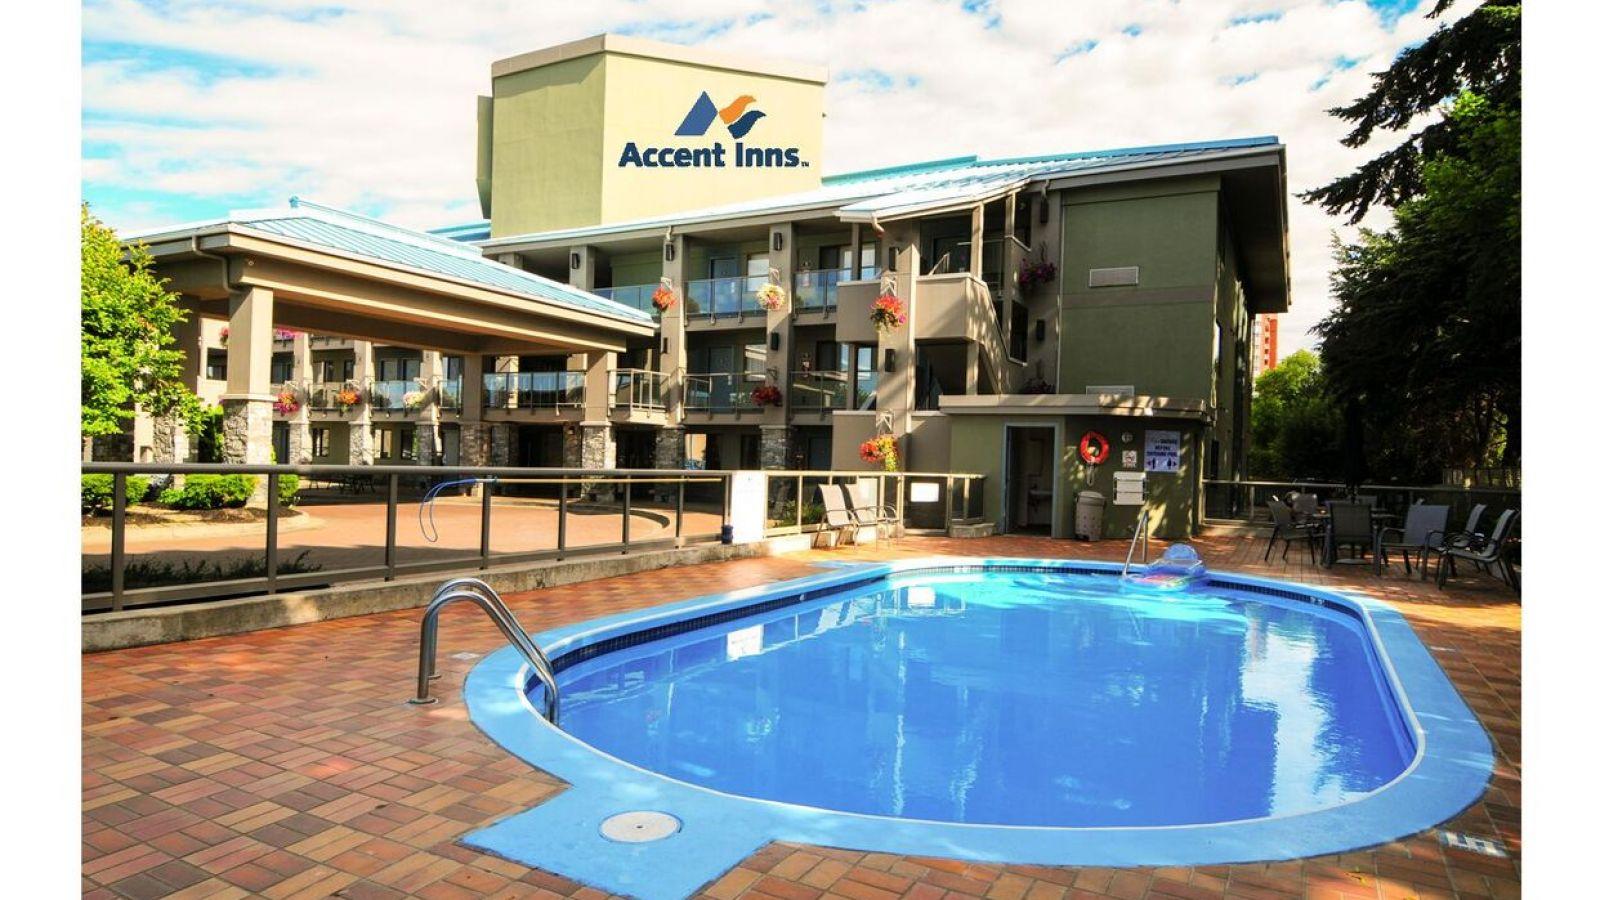 Accent Inn Kelowna - Kelowna golf packages